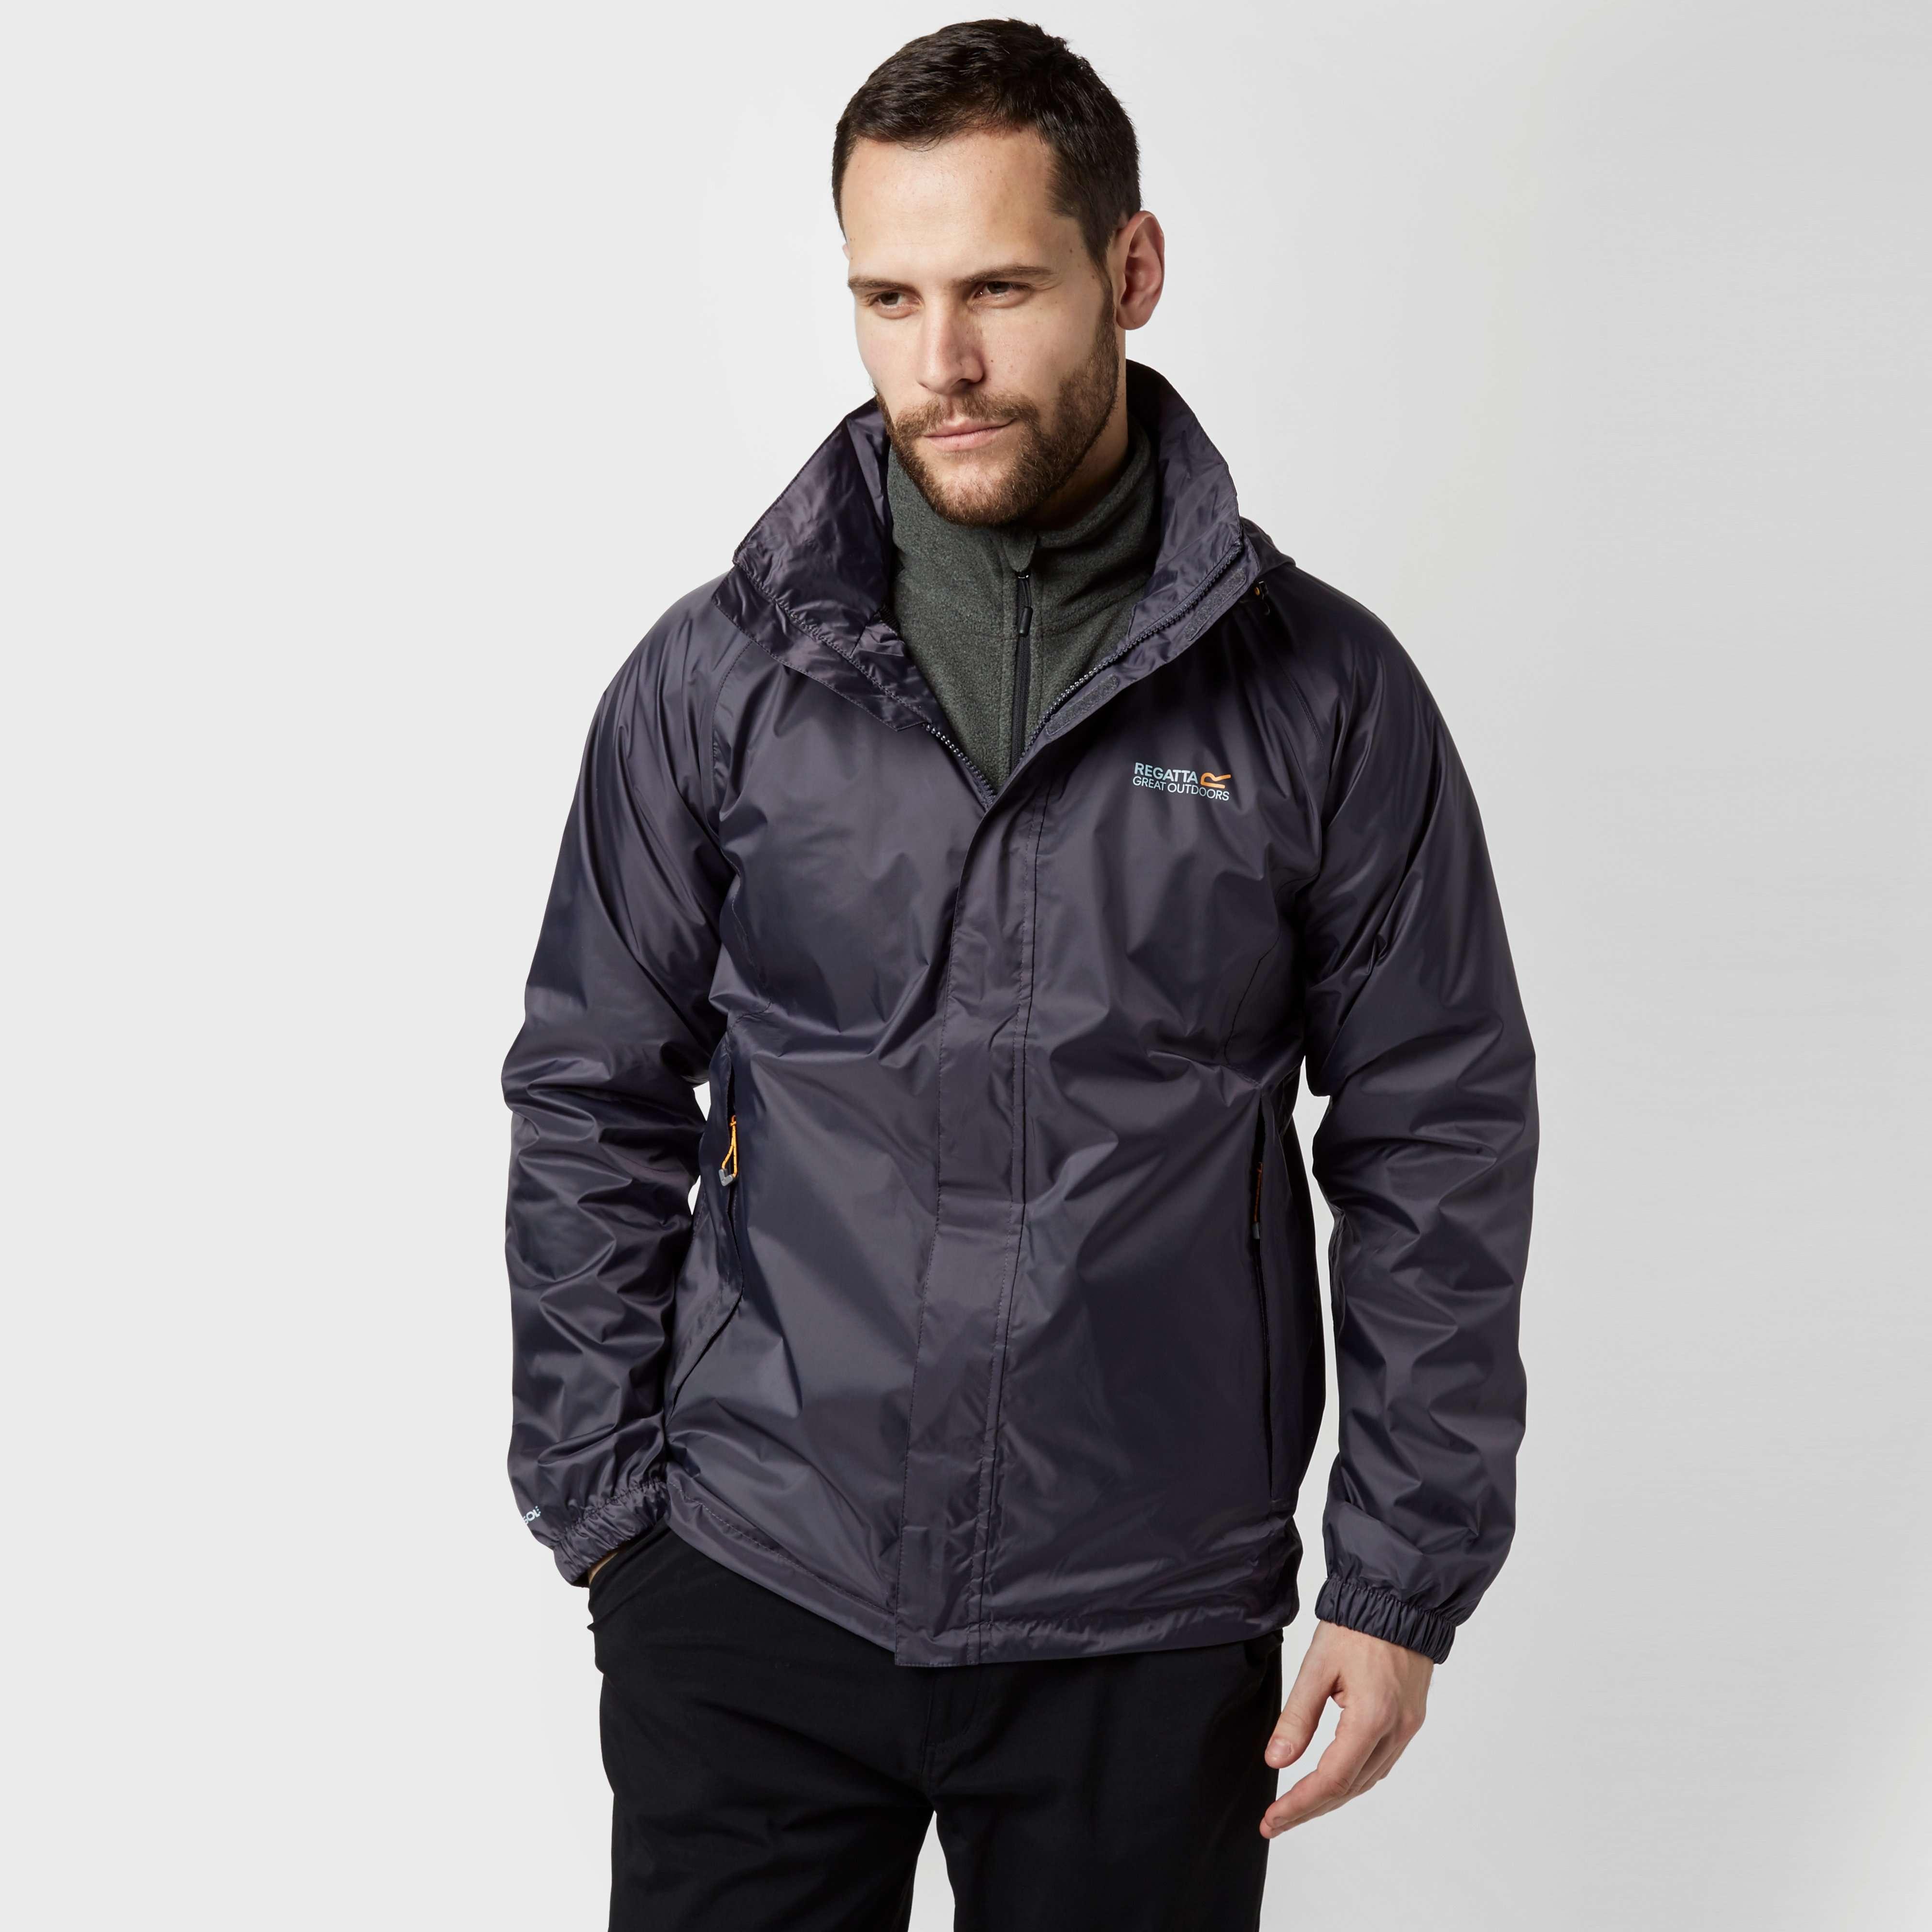 REGATTA Men's Magnitude IV Waterproof Jacket